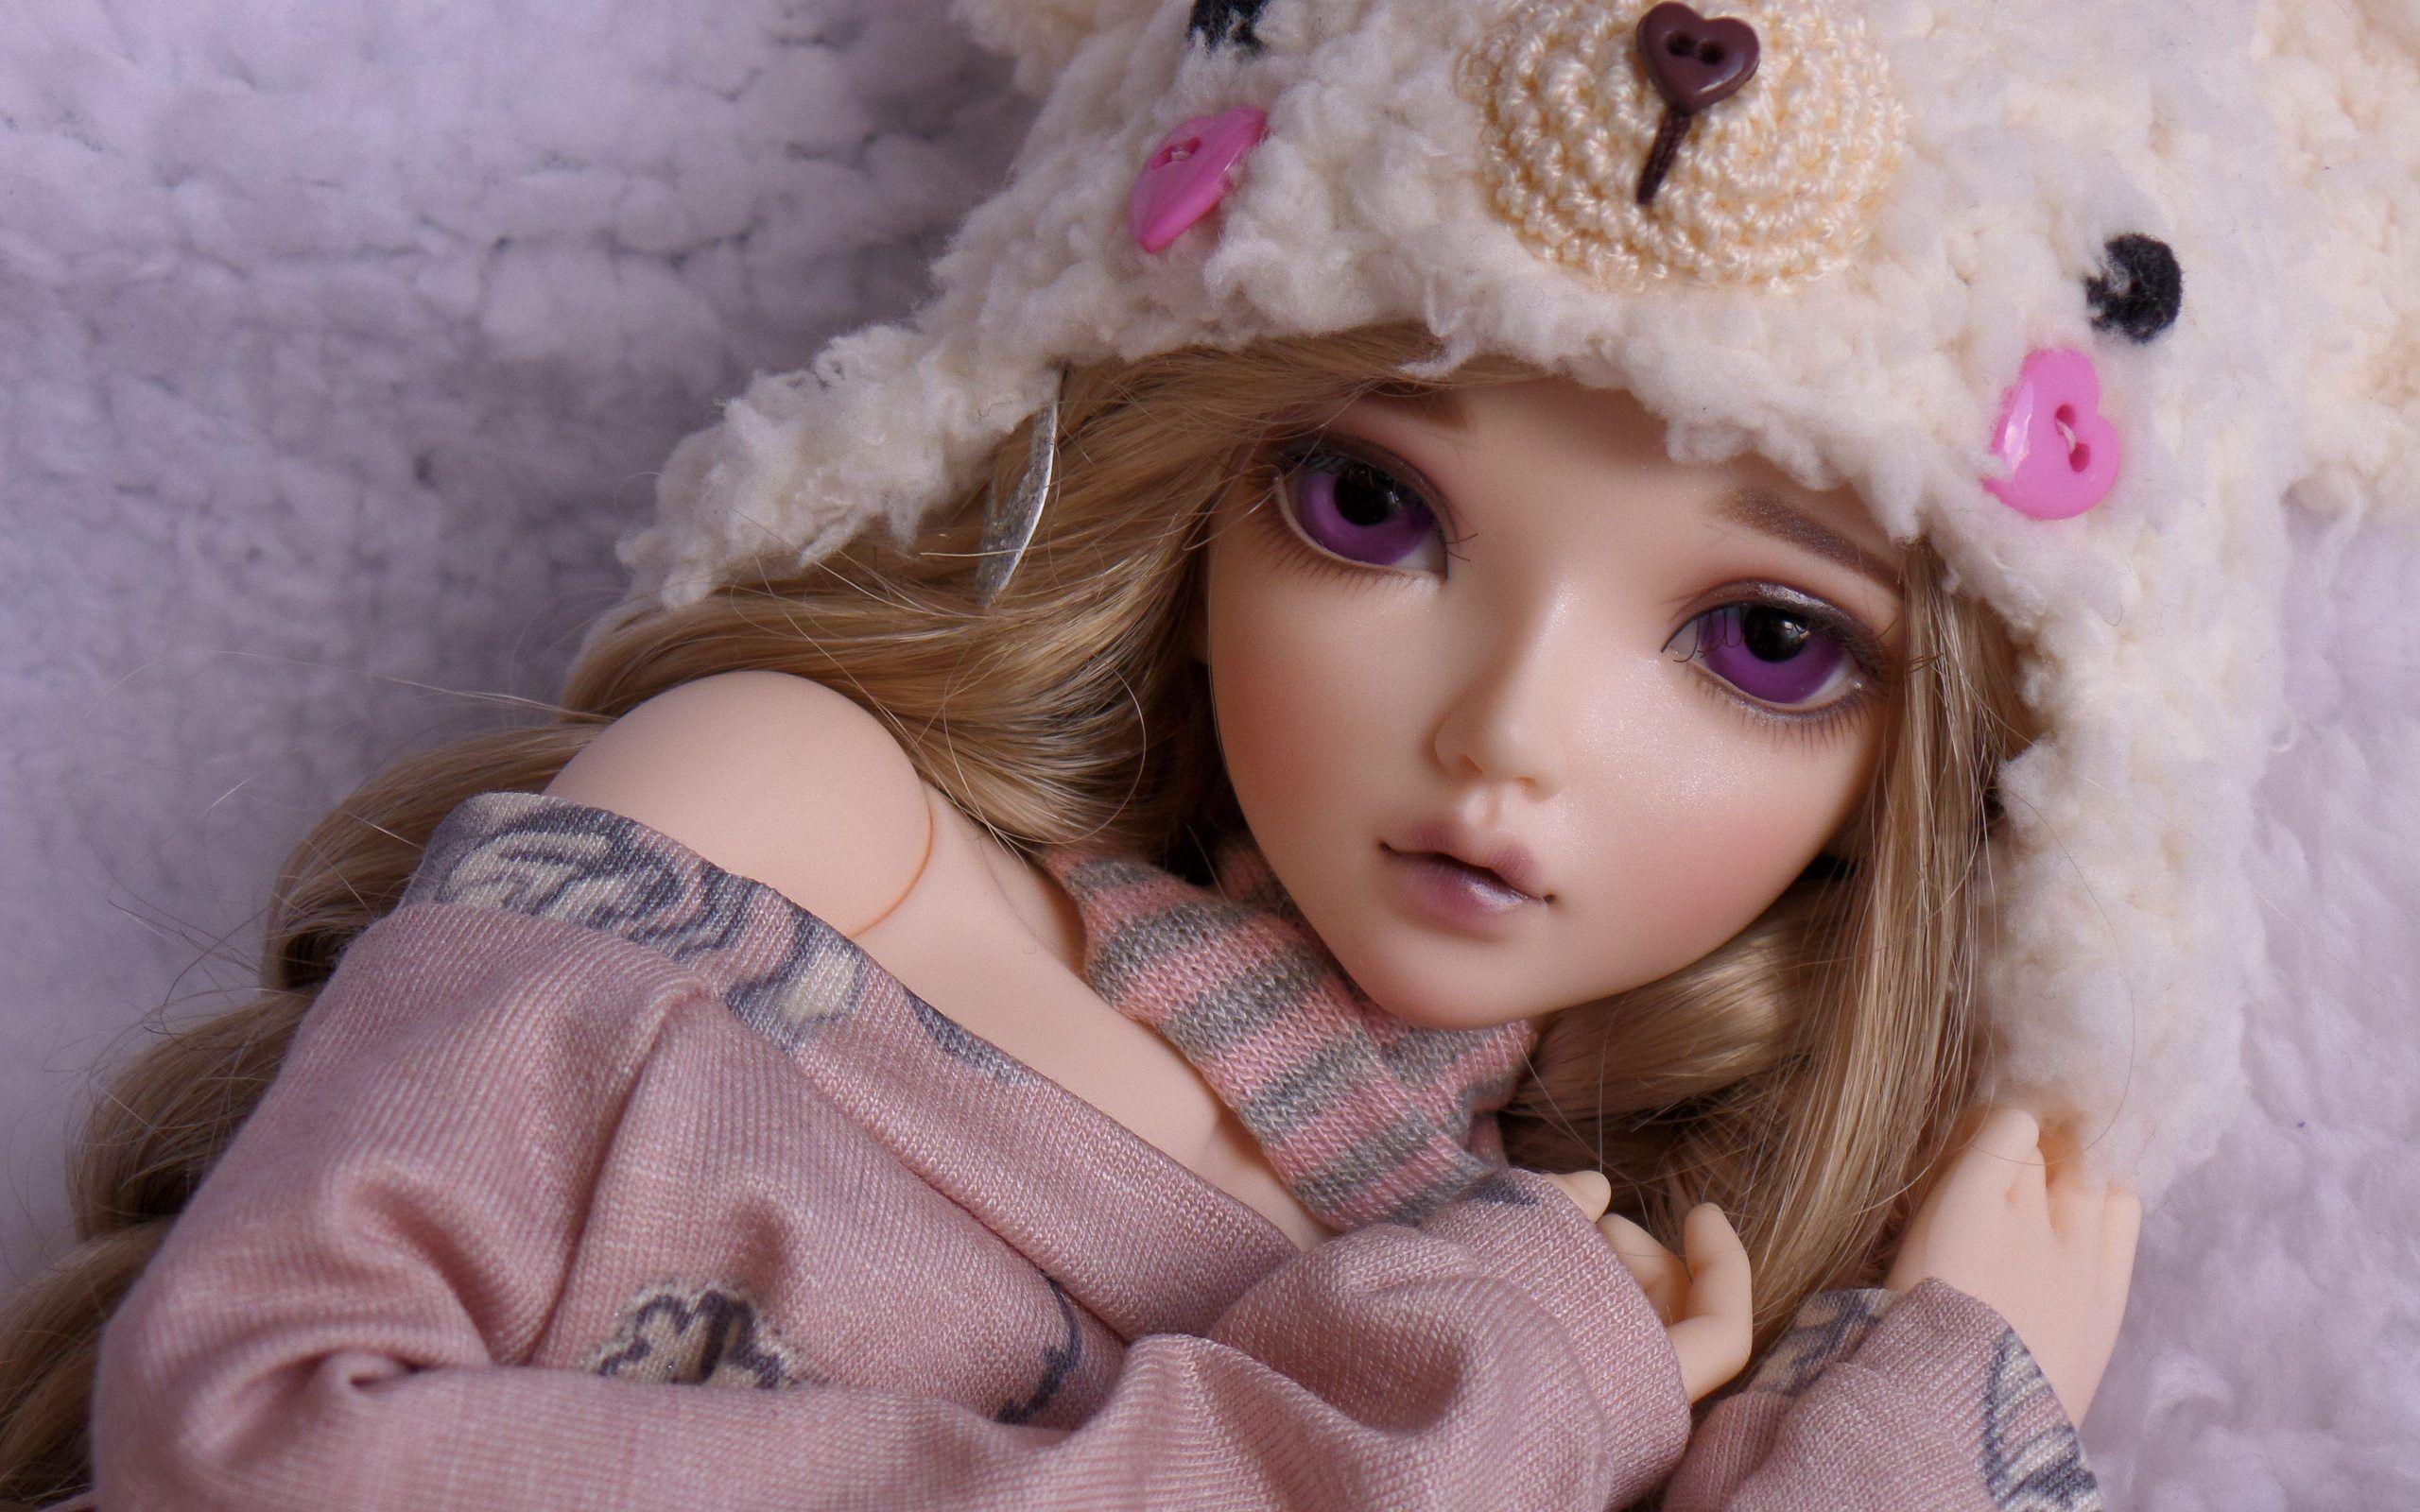 Cute Barbie Doll Dp Girls Cute Dolls Barbie Dolls Kawaii Doll